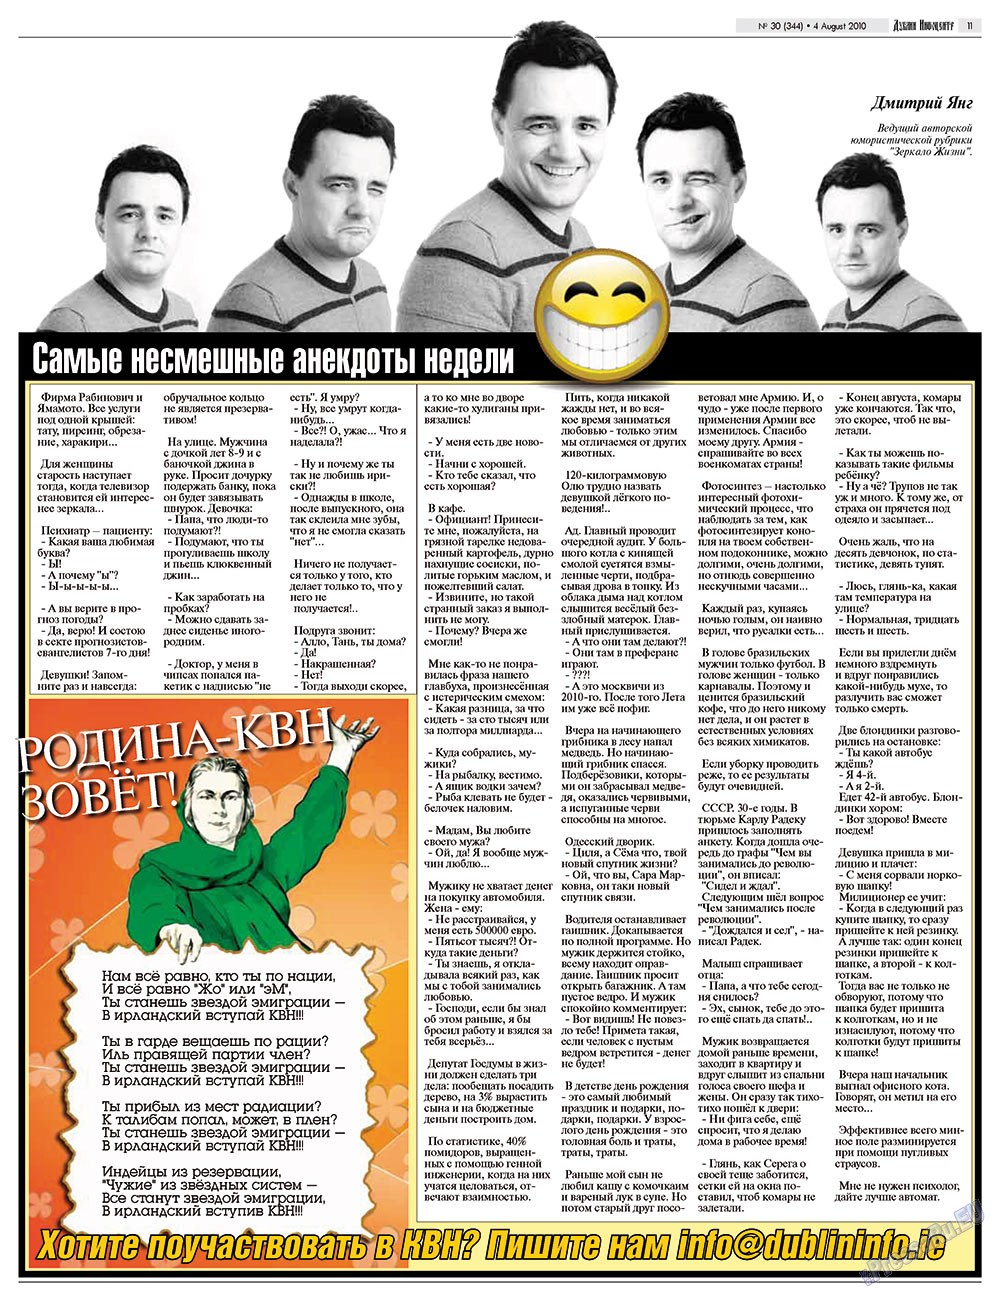 Дублин инфоцентр (газета). 2010 год, номер 30, стр. 11